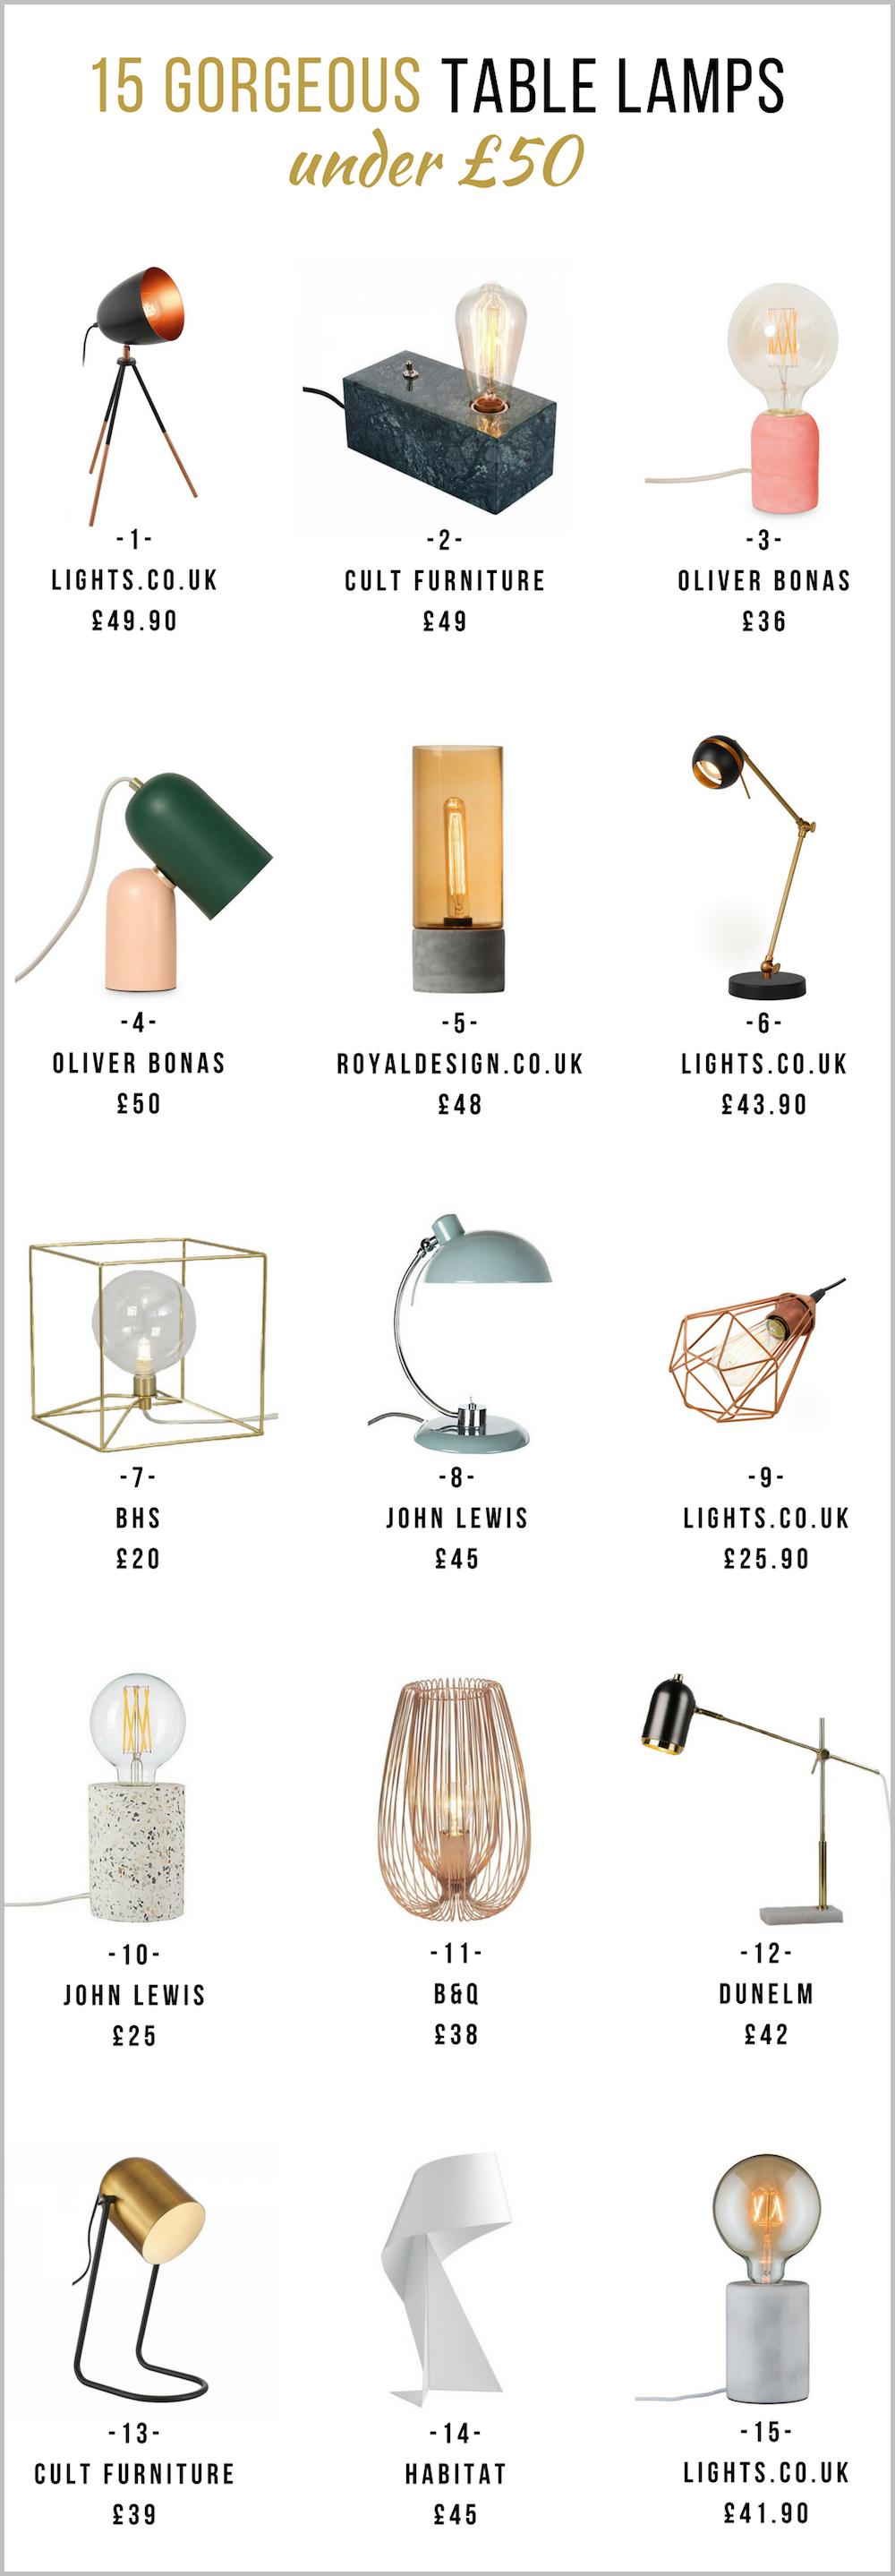 Green Marble Block Lamp 3 Vico Pink Concrete 4 Capsule Table 5 Albin And Glass 6 Binari Black Gold 7